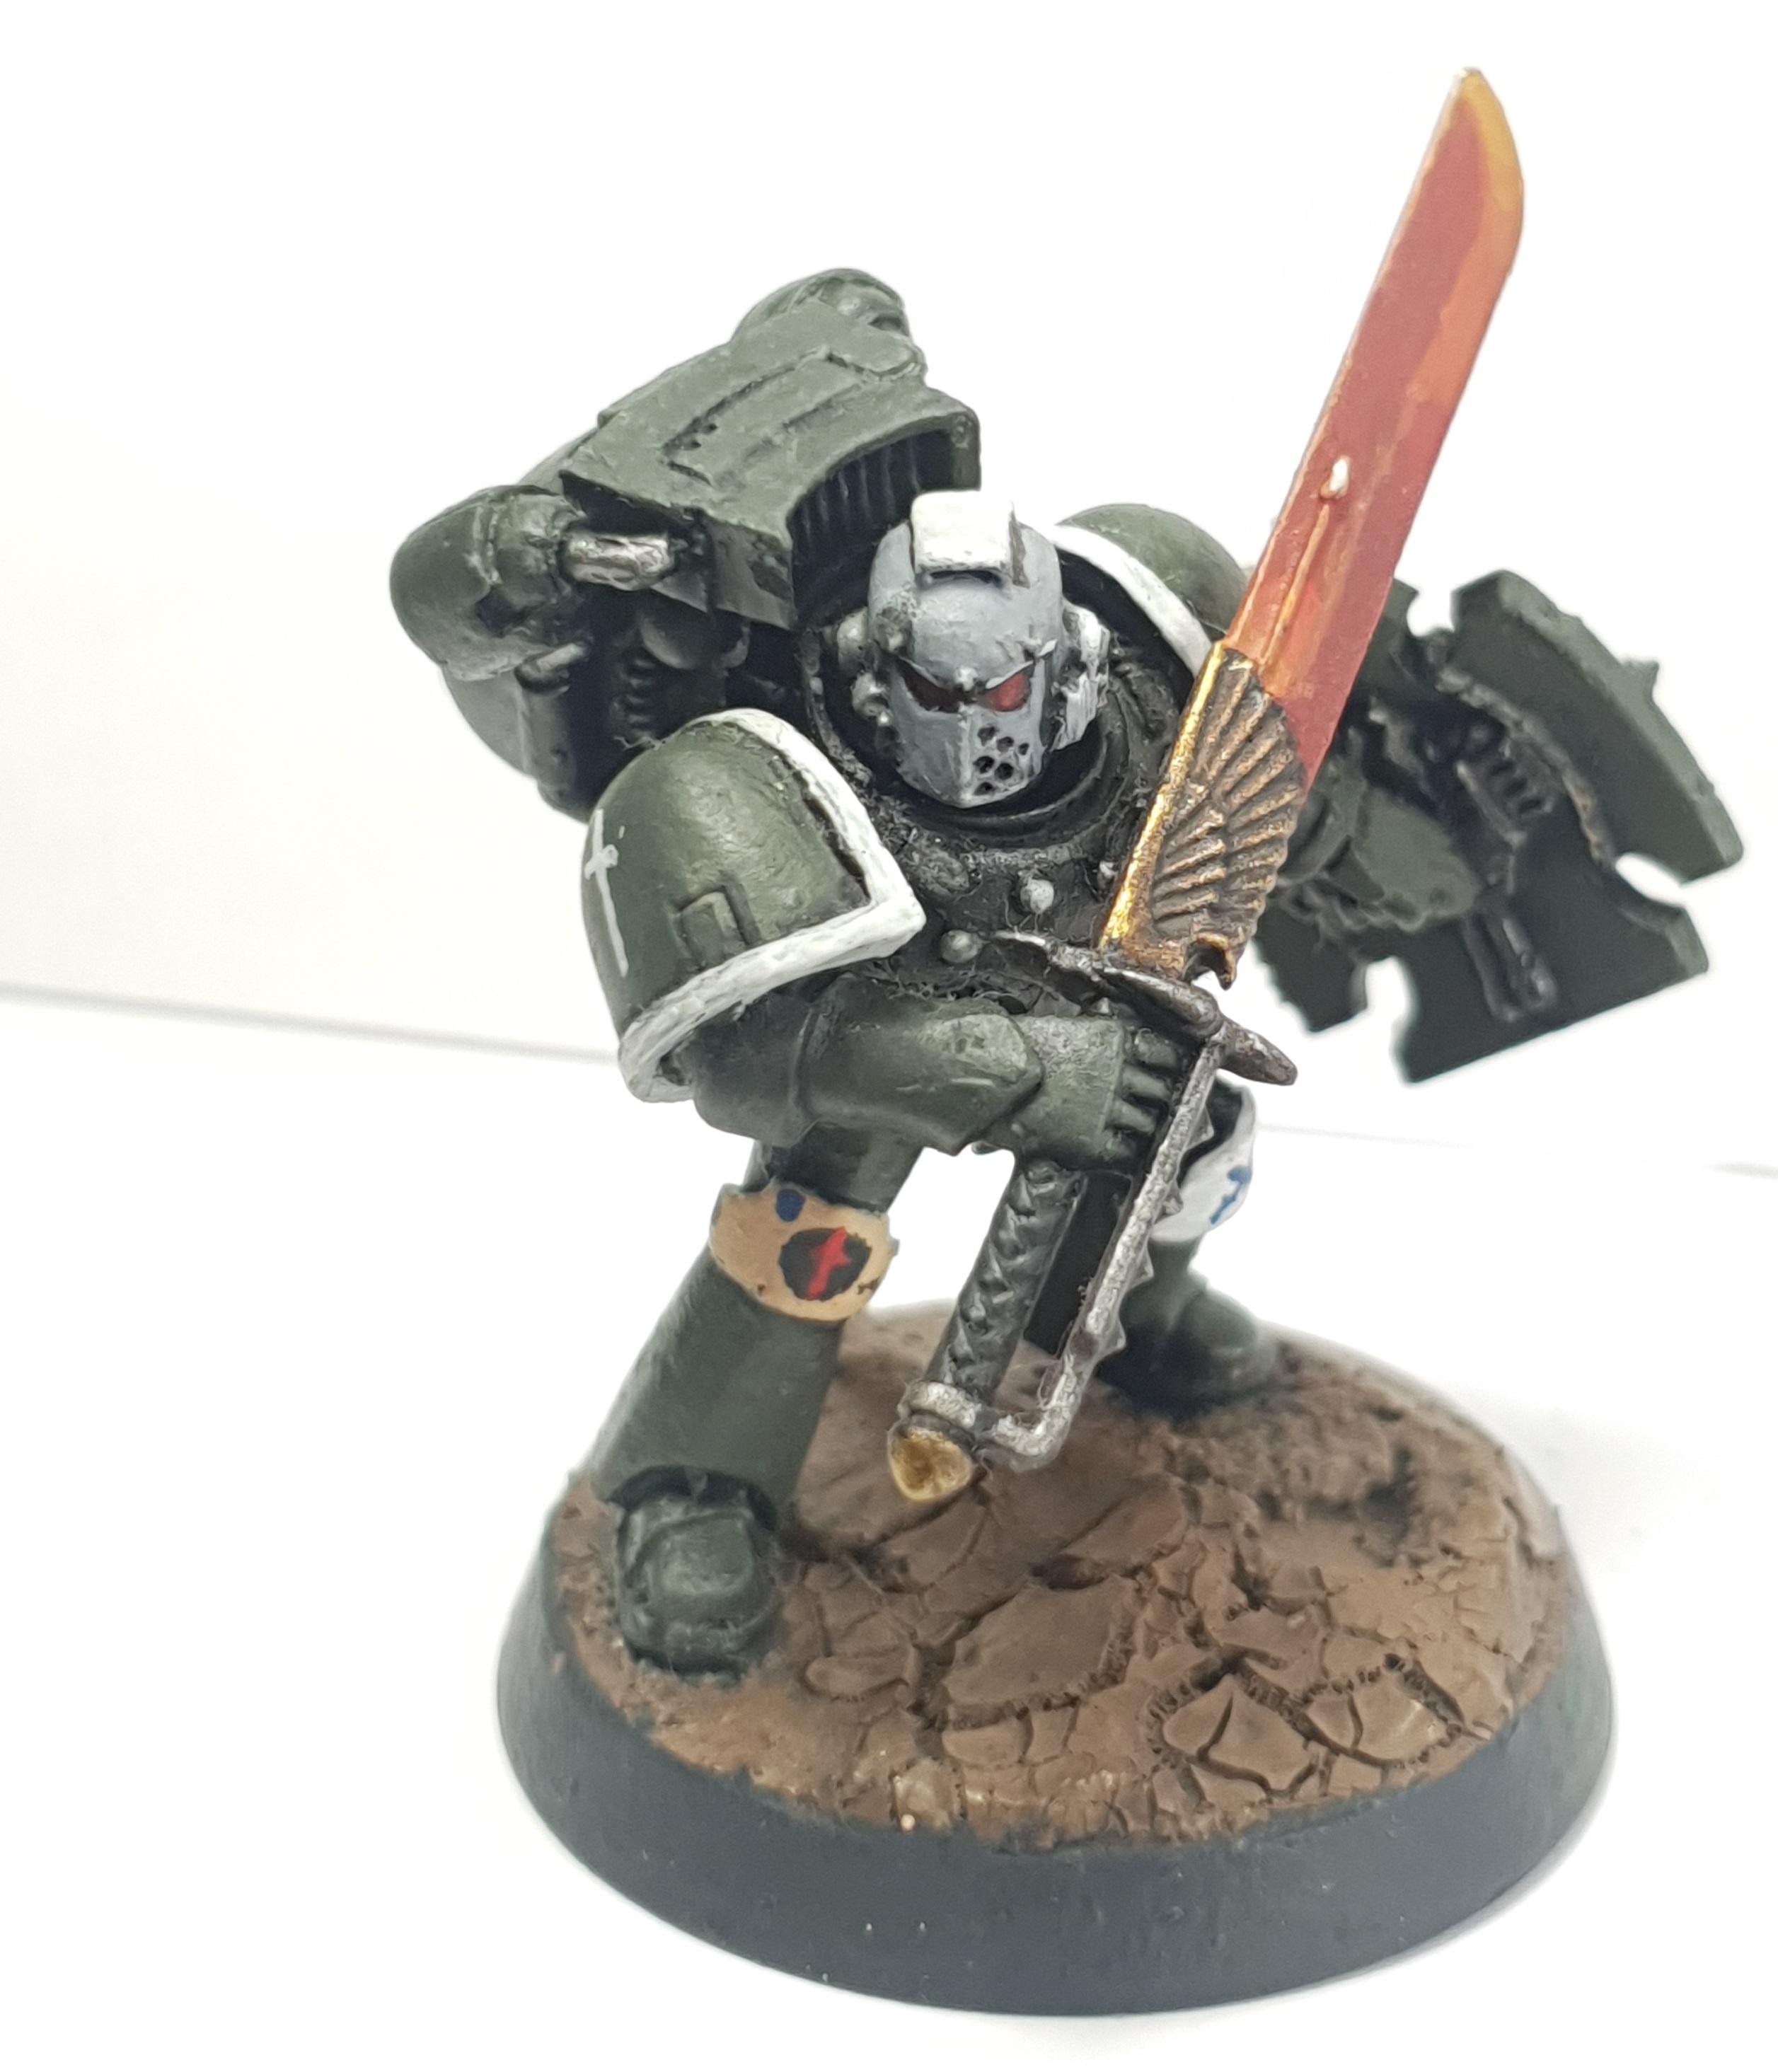 Sword of Davion Space Marine Vanguard Veteran Squad Sergeant